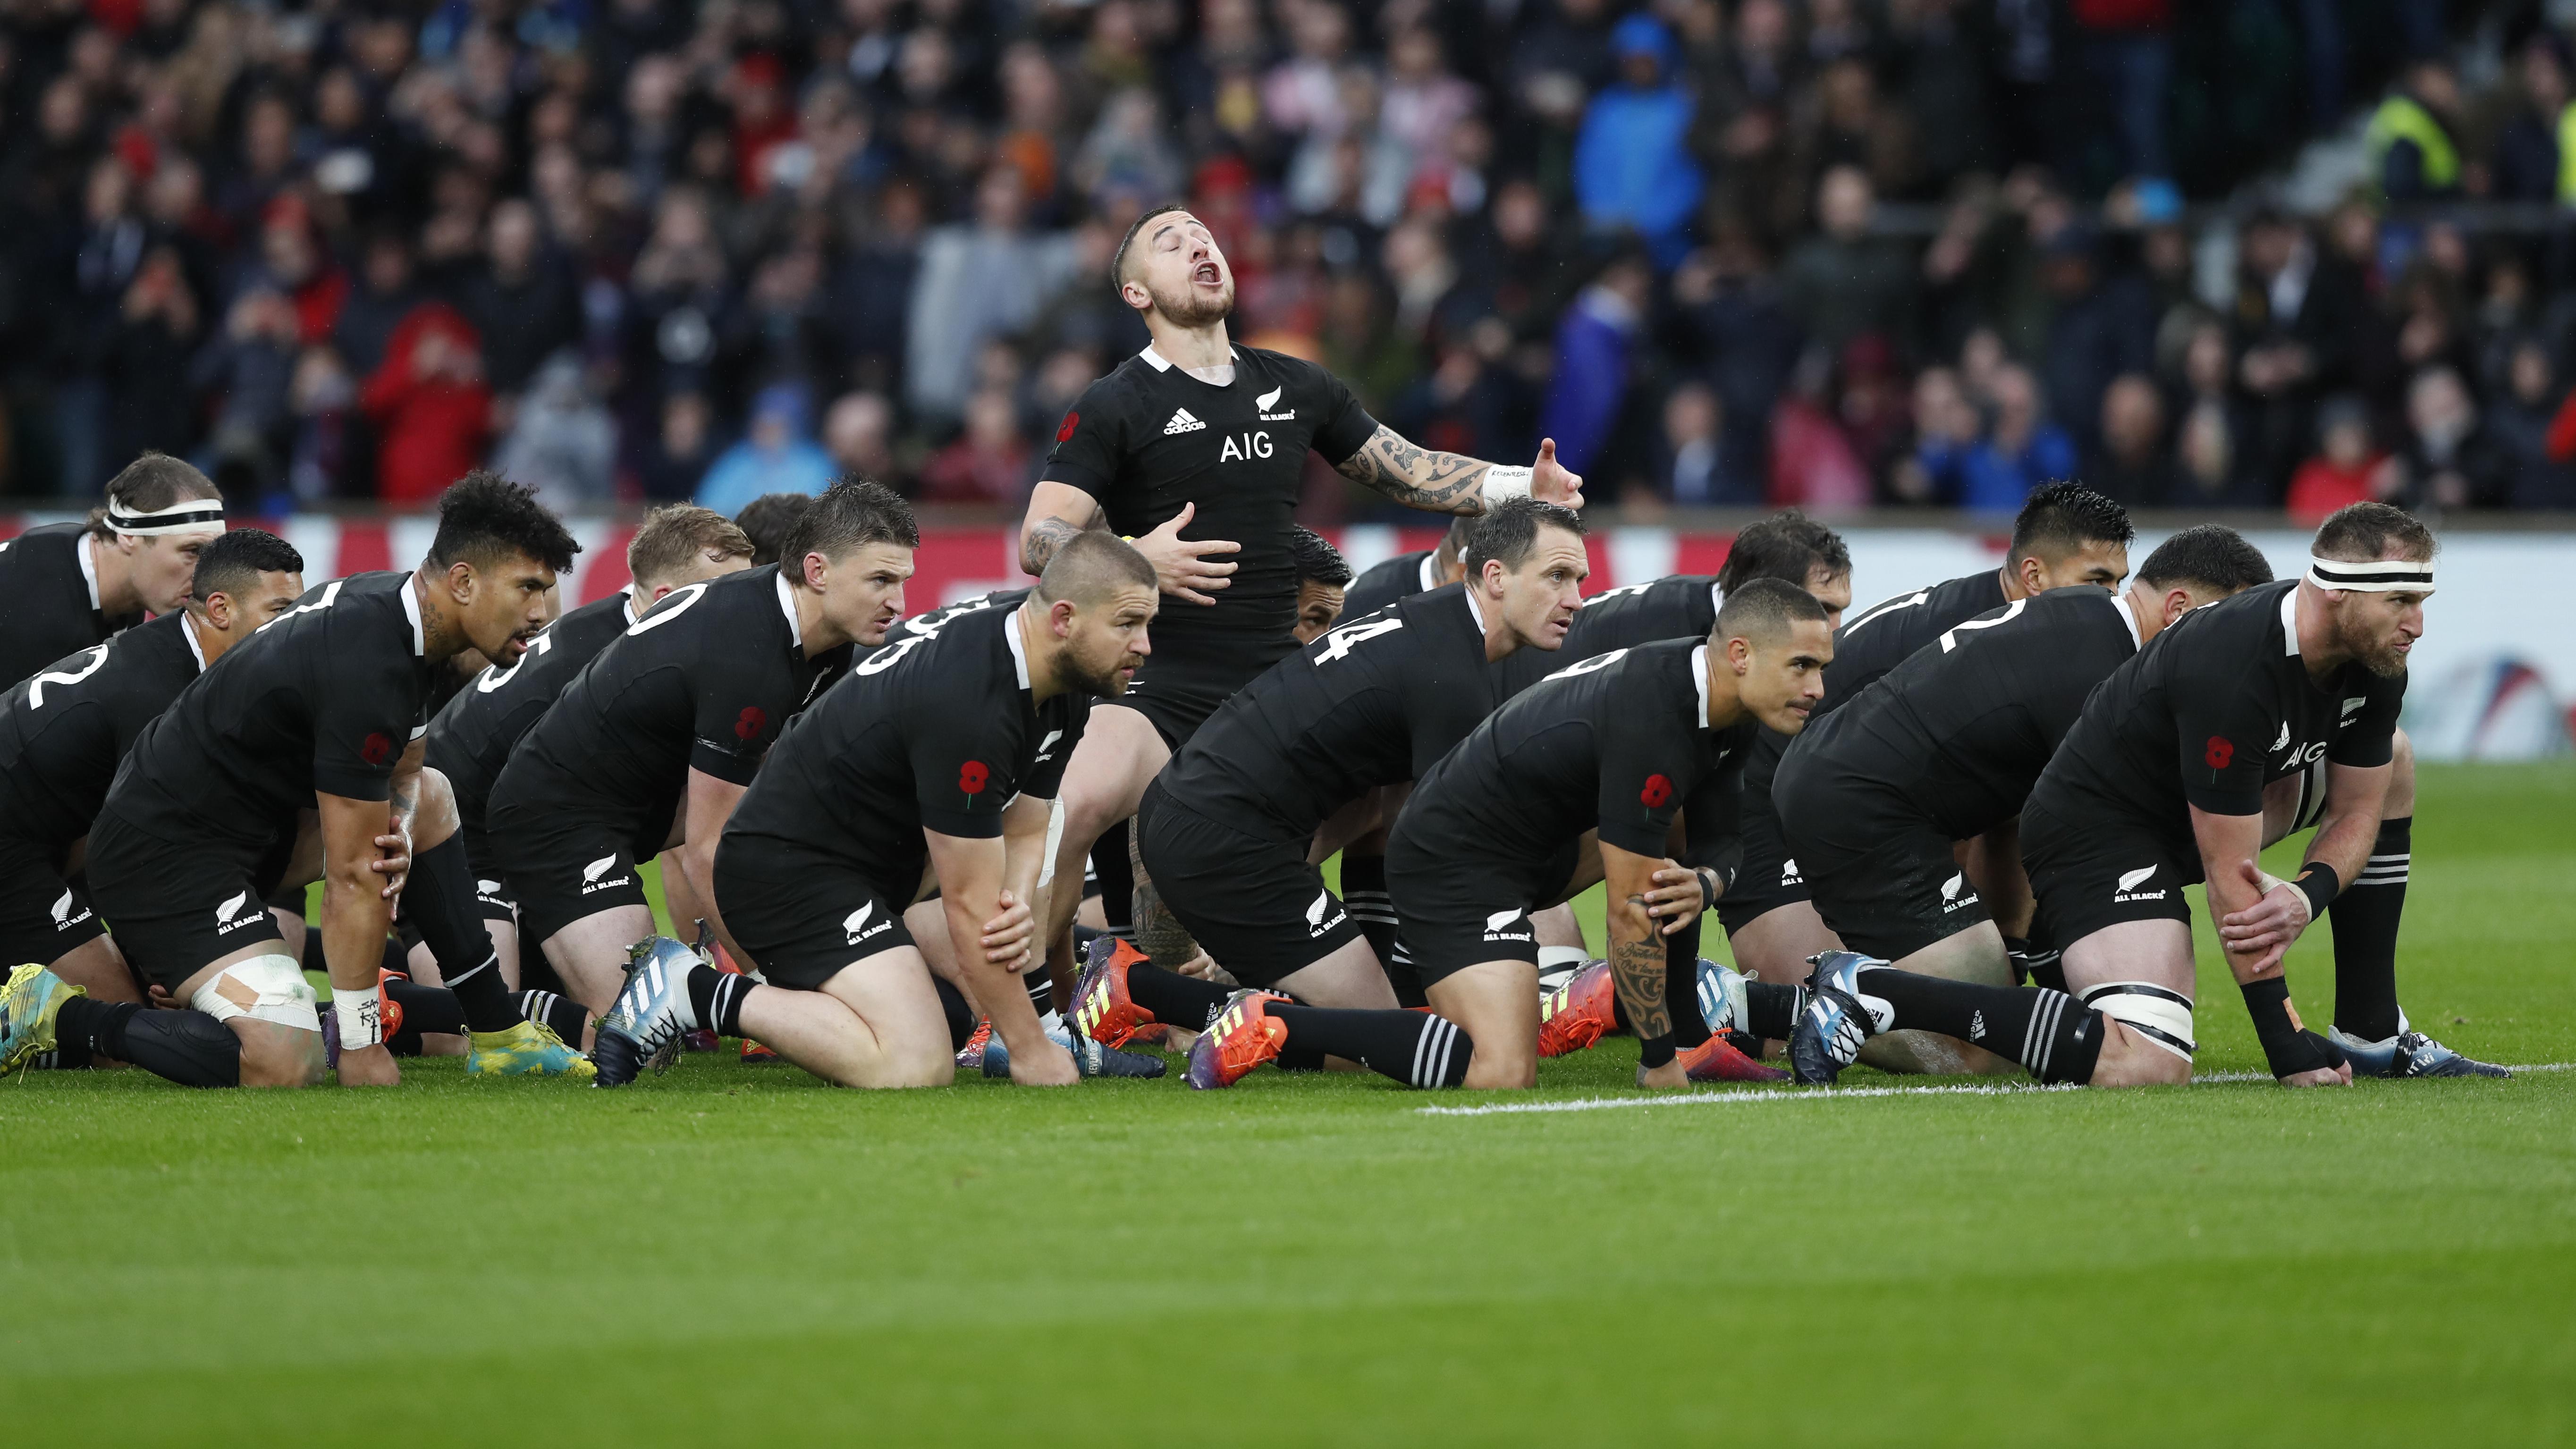 England vs New Zealand Report